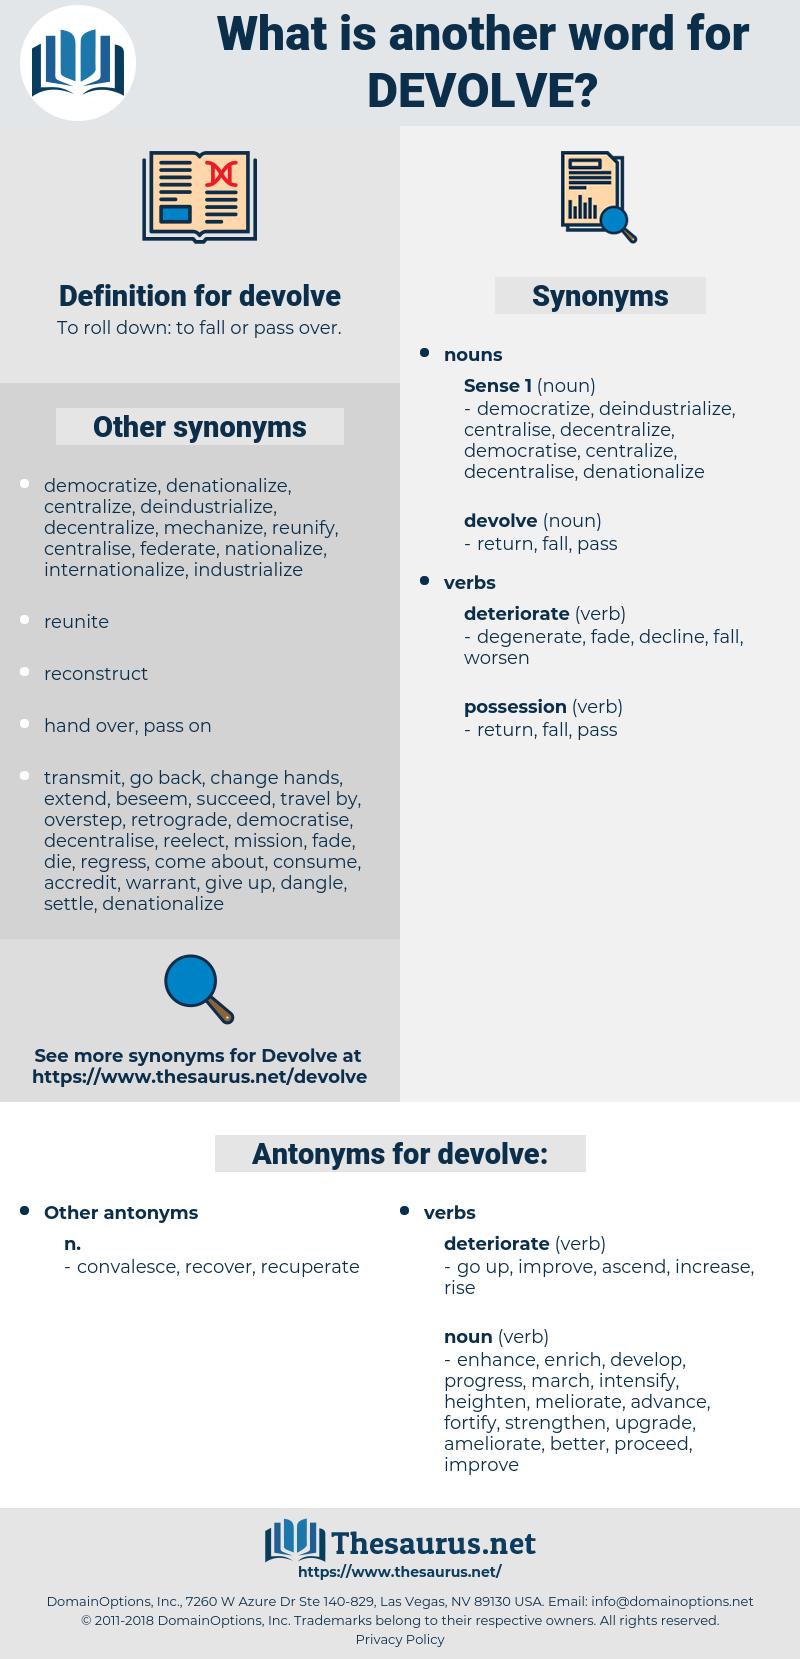 devolve, synonym devolve, another word for devolve, words like devolve, thesaurus devolve